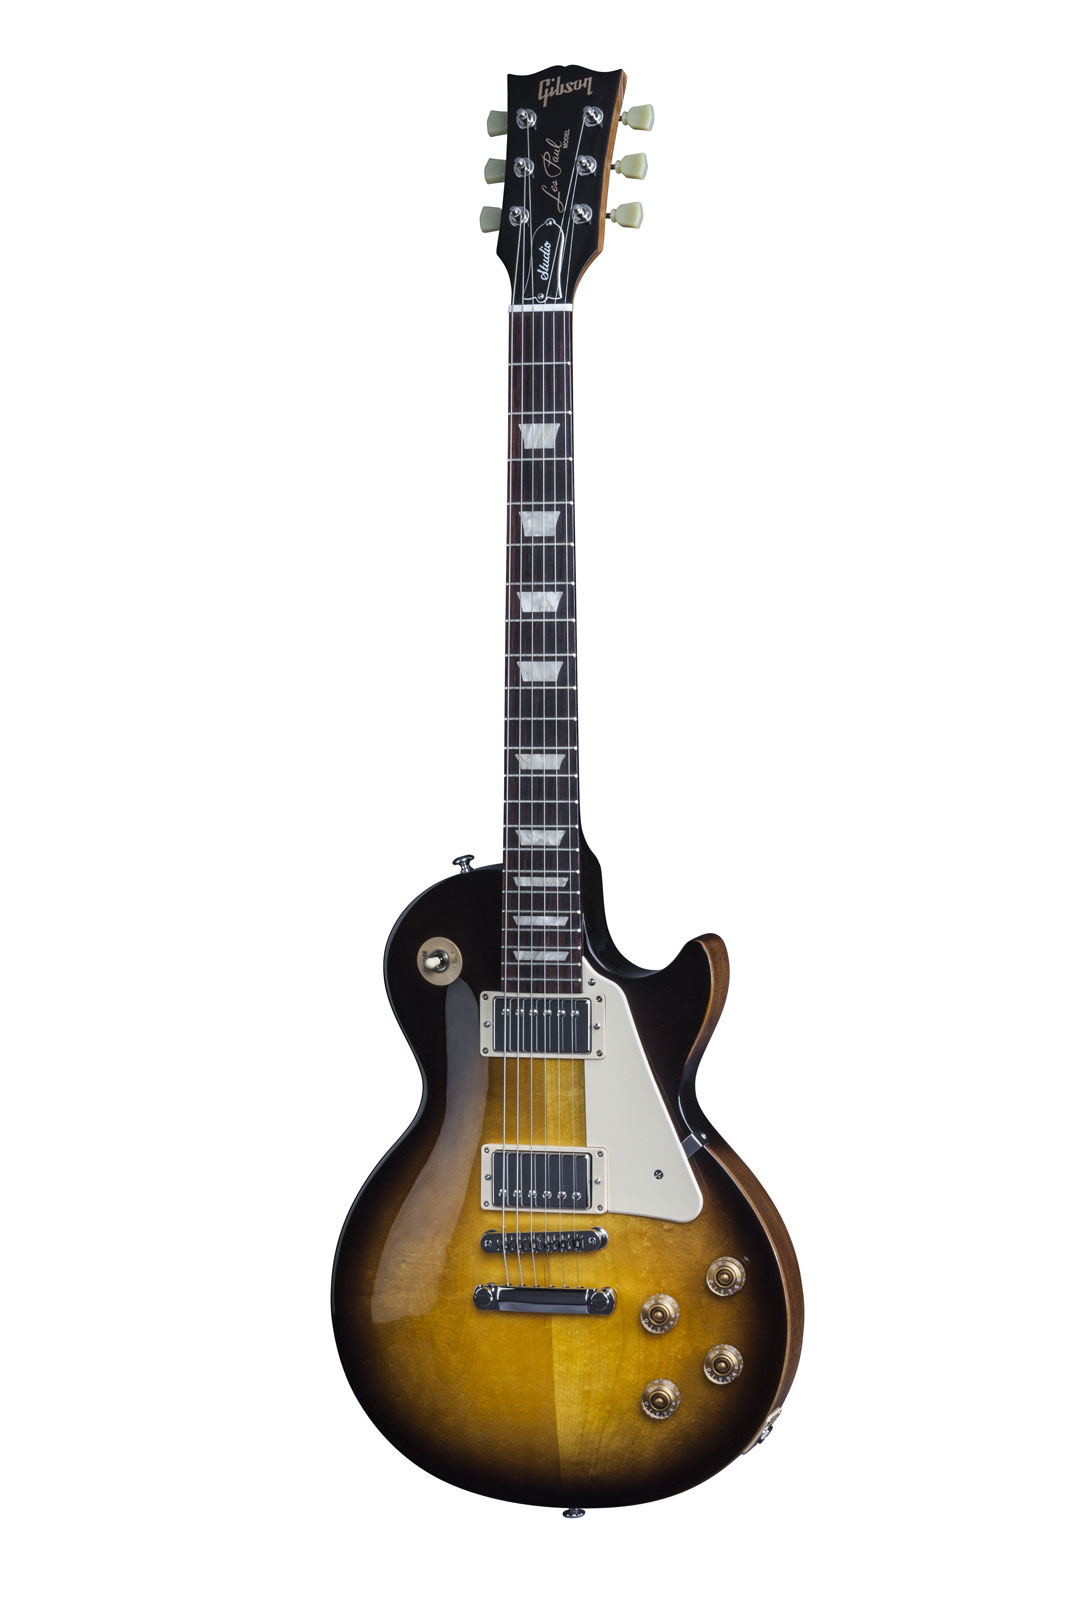 Gibson Les Paul Lp Studio 2016 T Vintage Sunburst + Etui